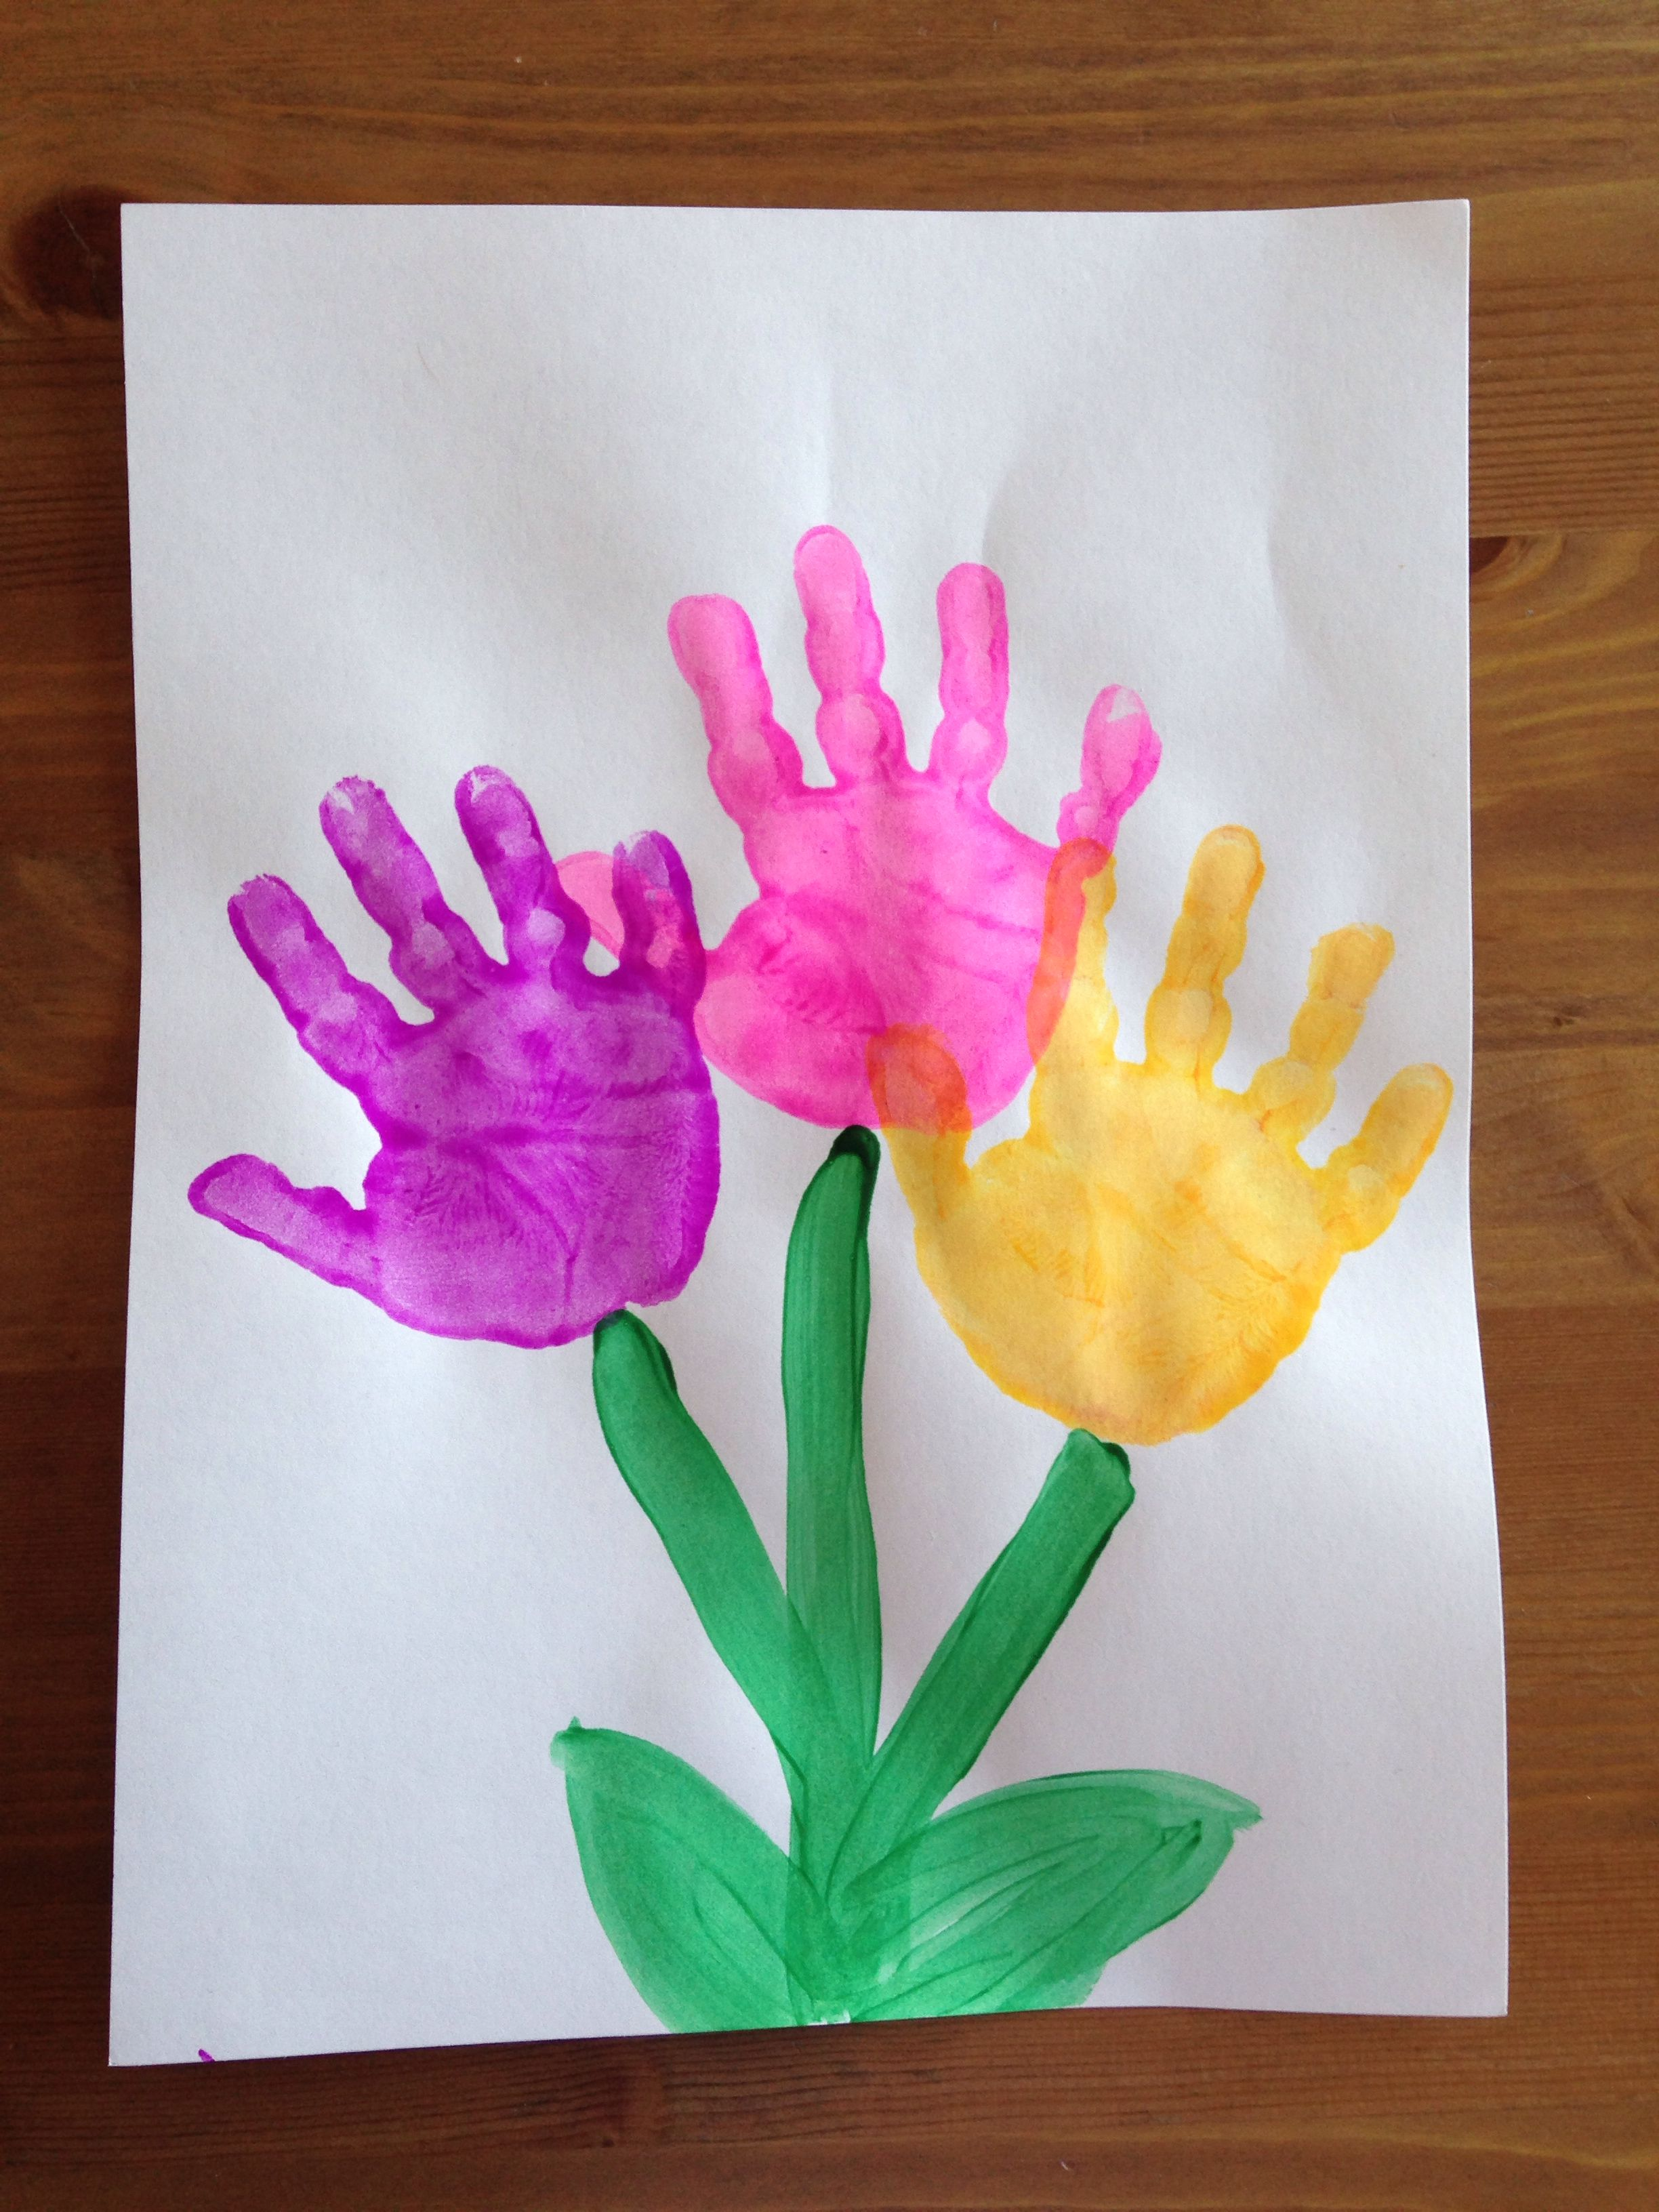 Handprint flower craft spring craft preschool craft for Preschool spring craft ideas